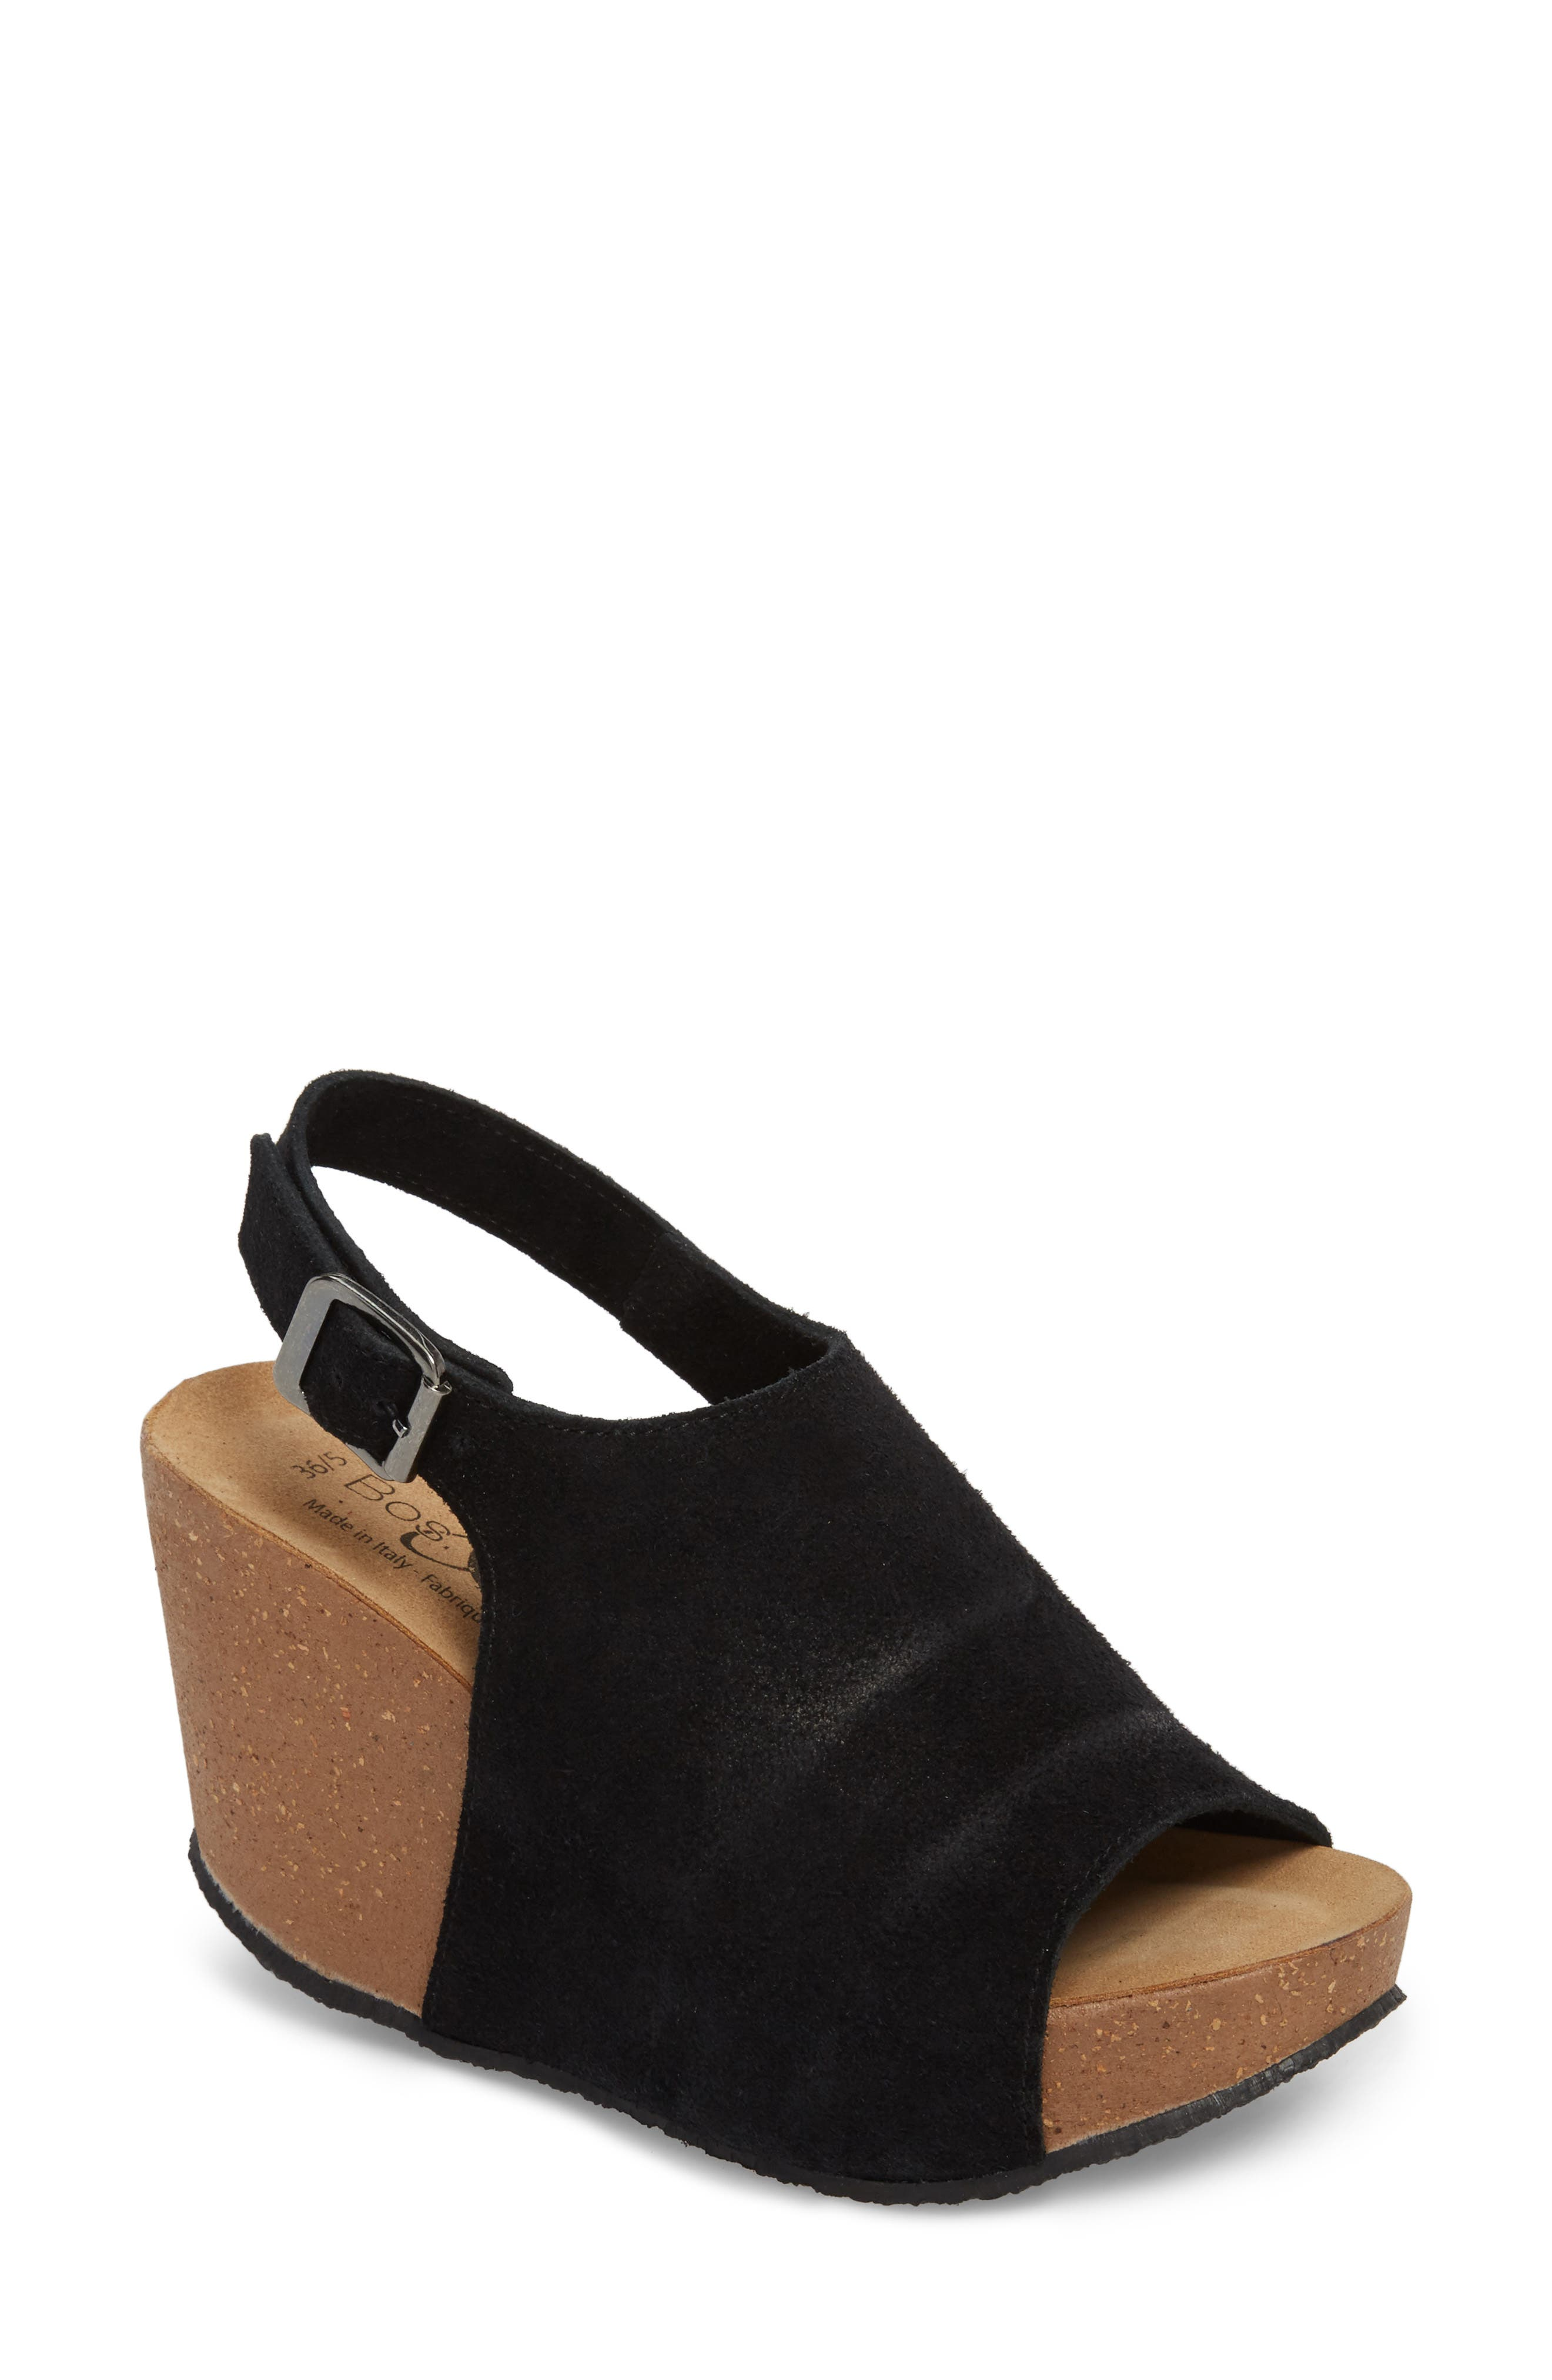 Bos. & Co. Sheila Platform Wedge Sandal - Black